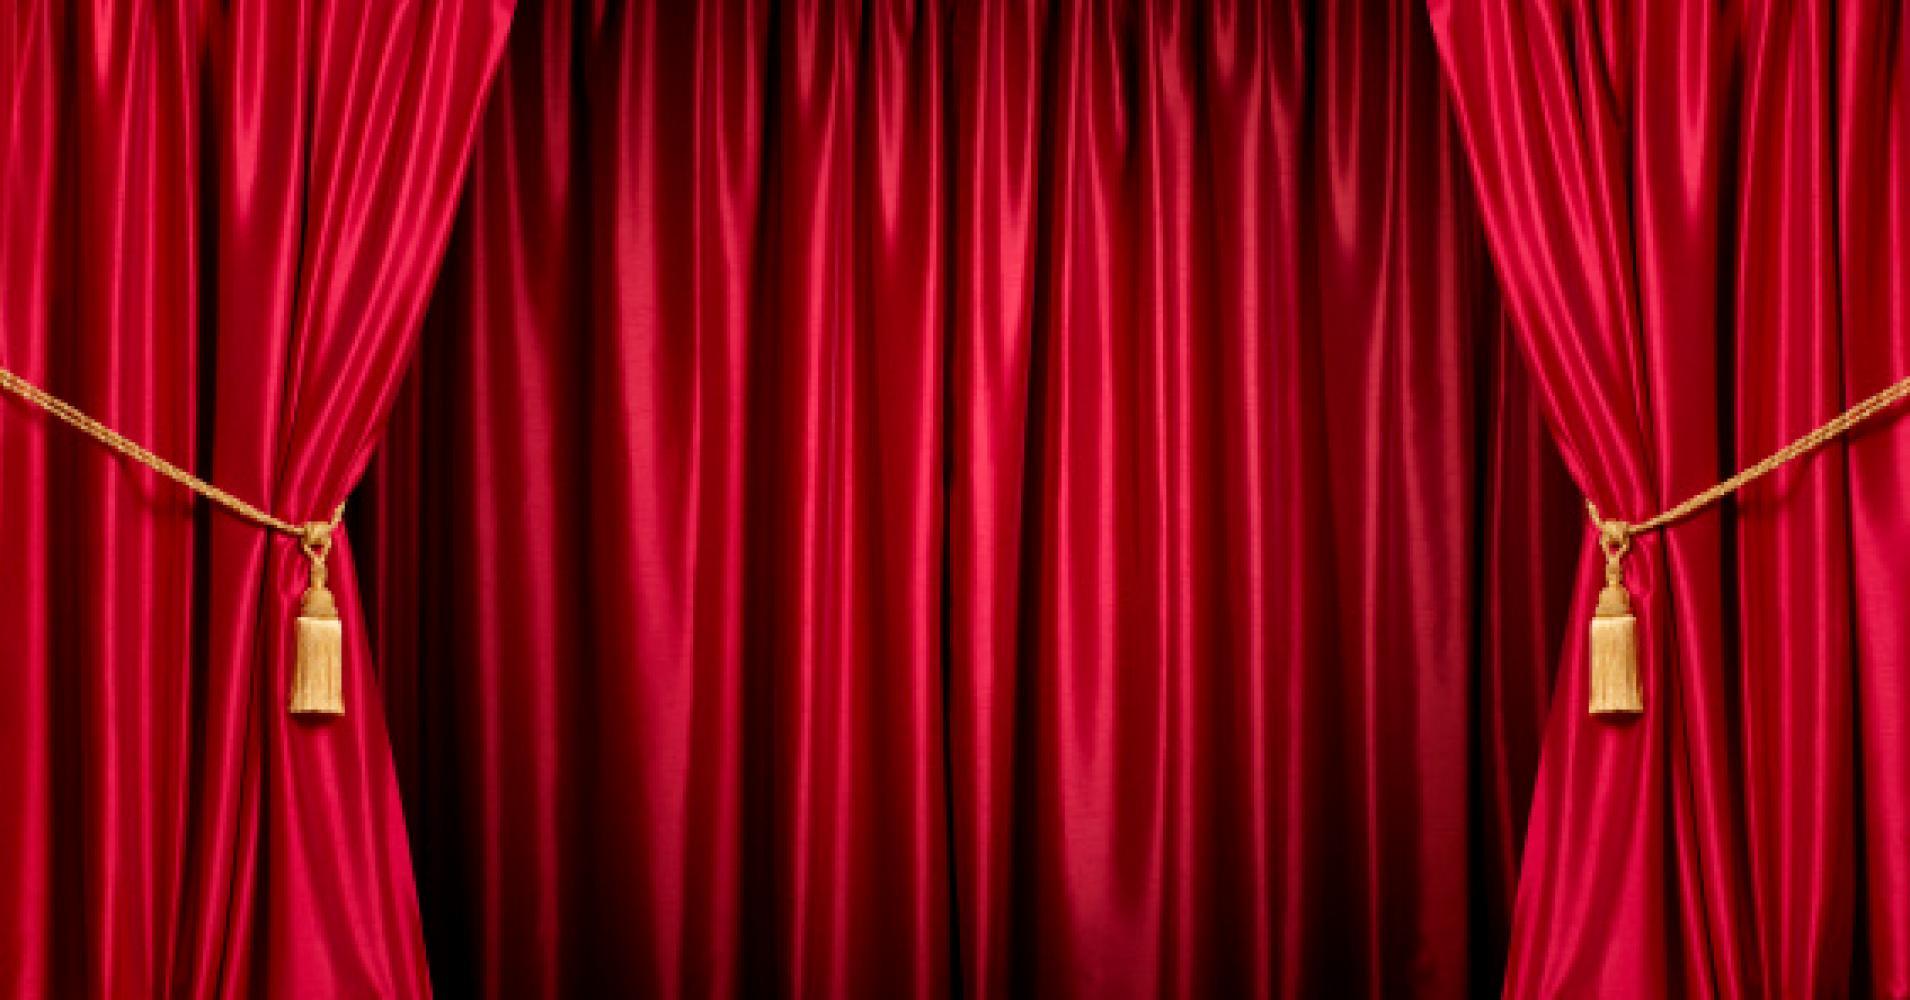 Curtain call clipart  Clipground